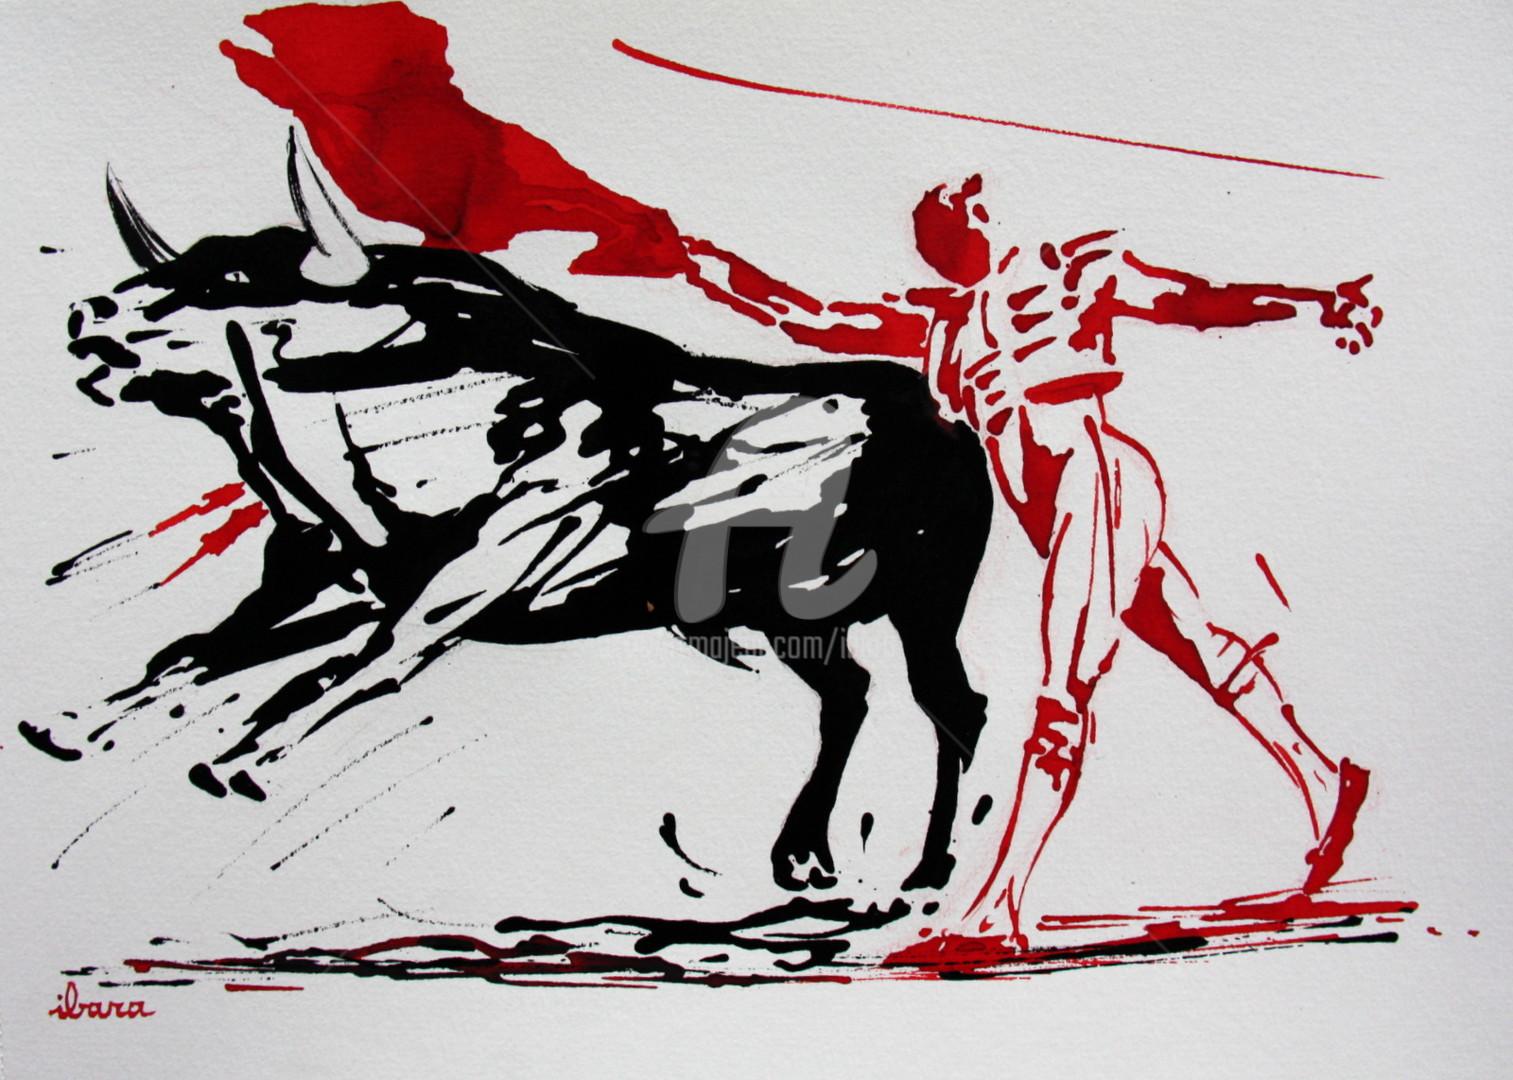 Henri Ibara - Tauromachie N°5